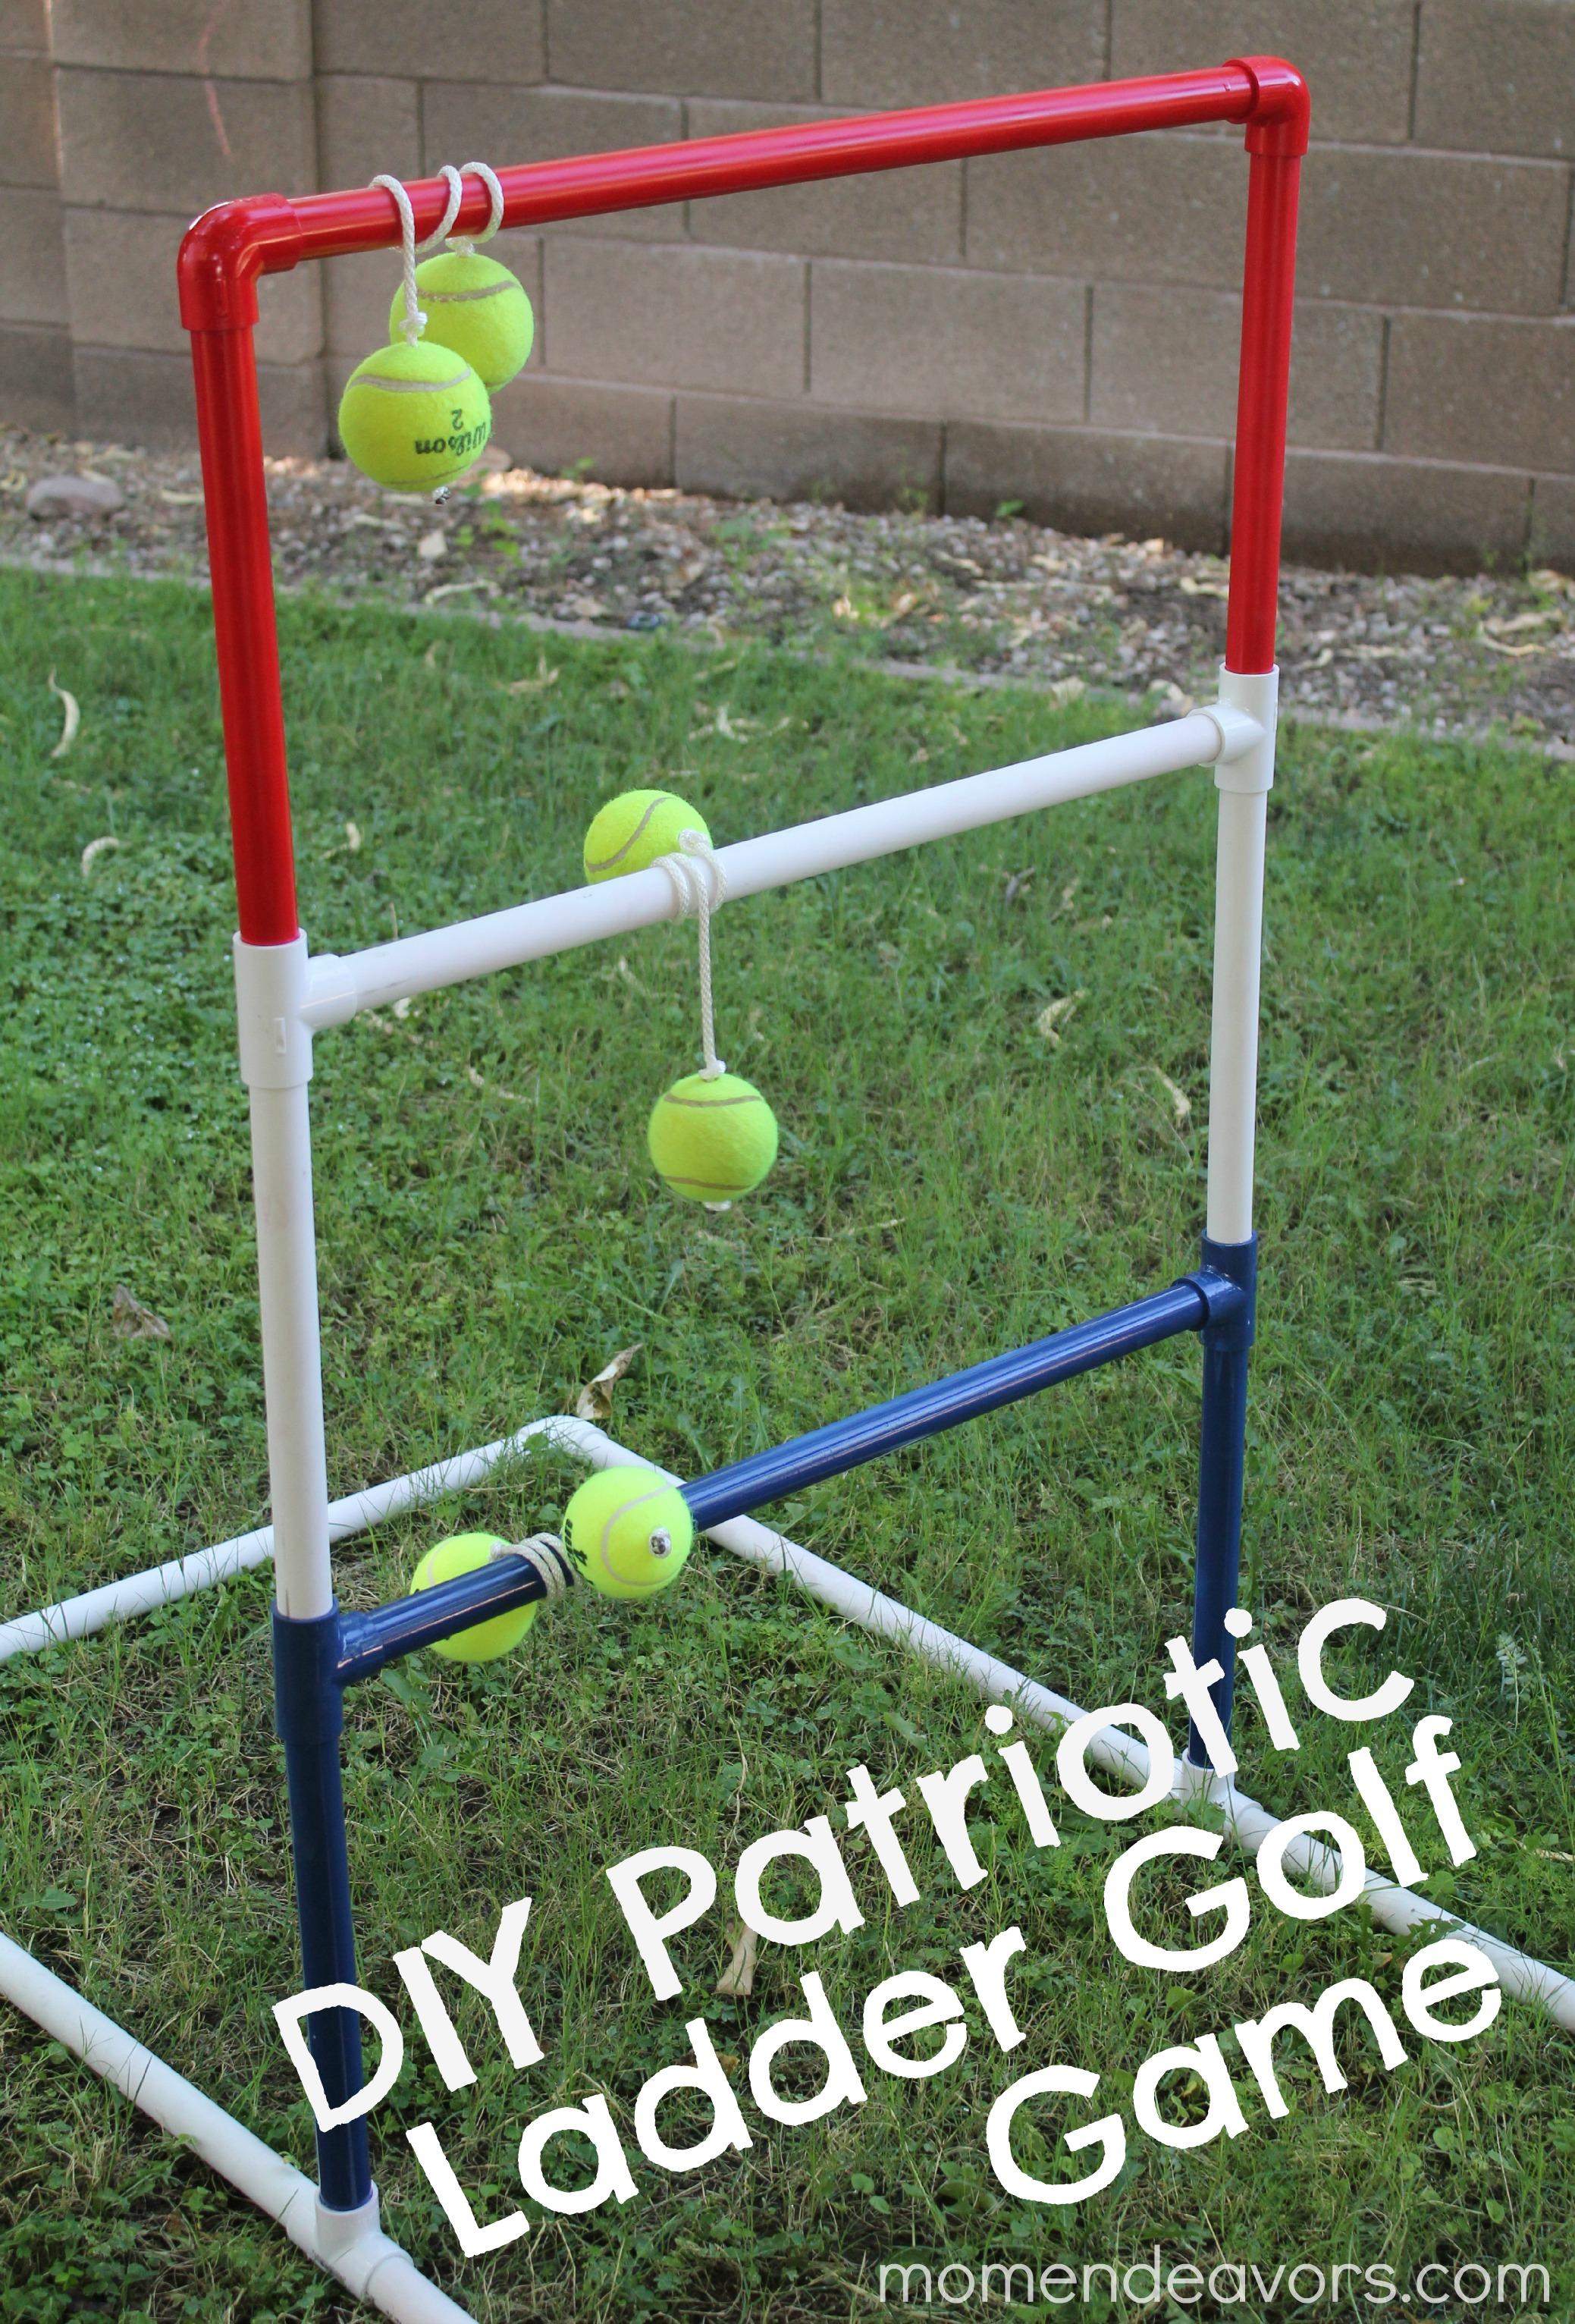 DIY-Patriotic-Ladder-Golf-Game1